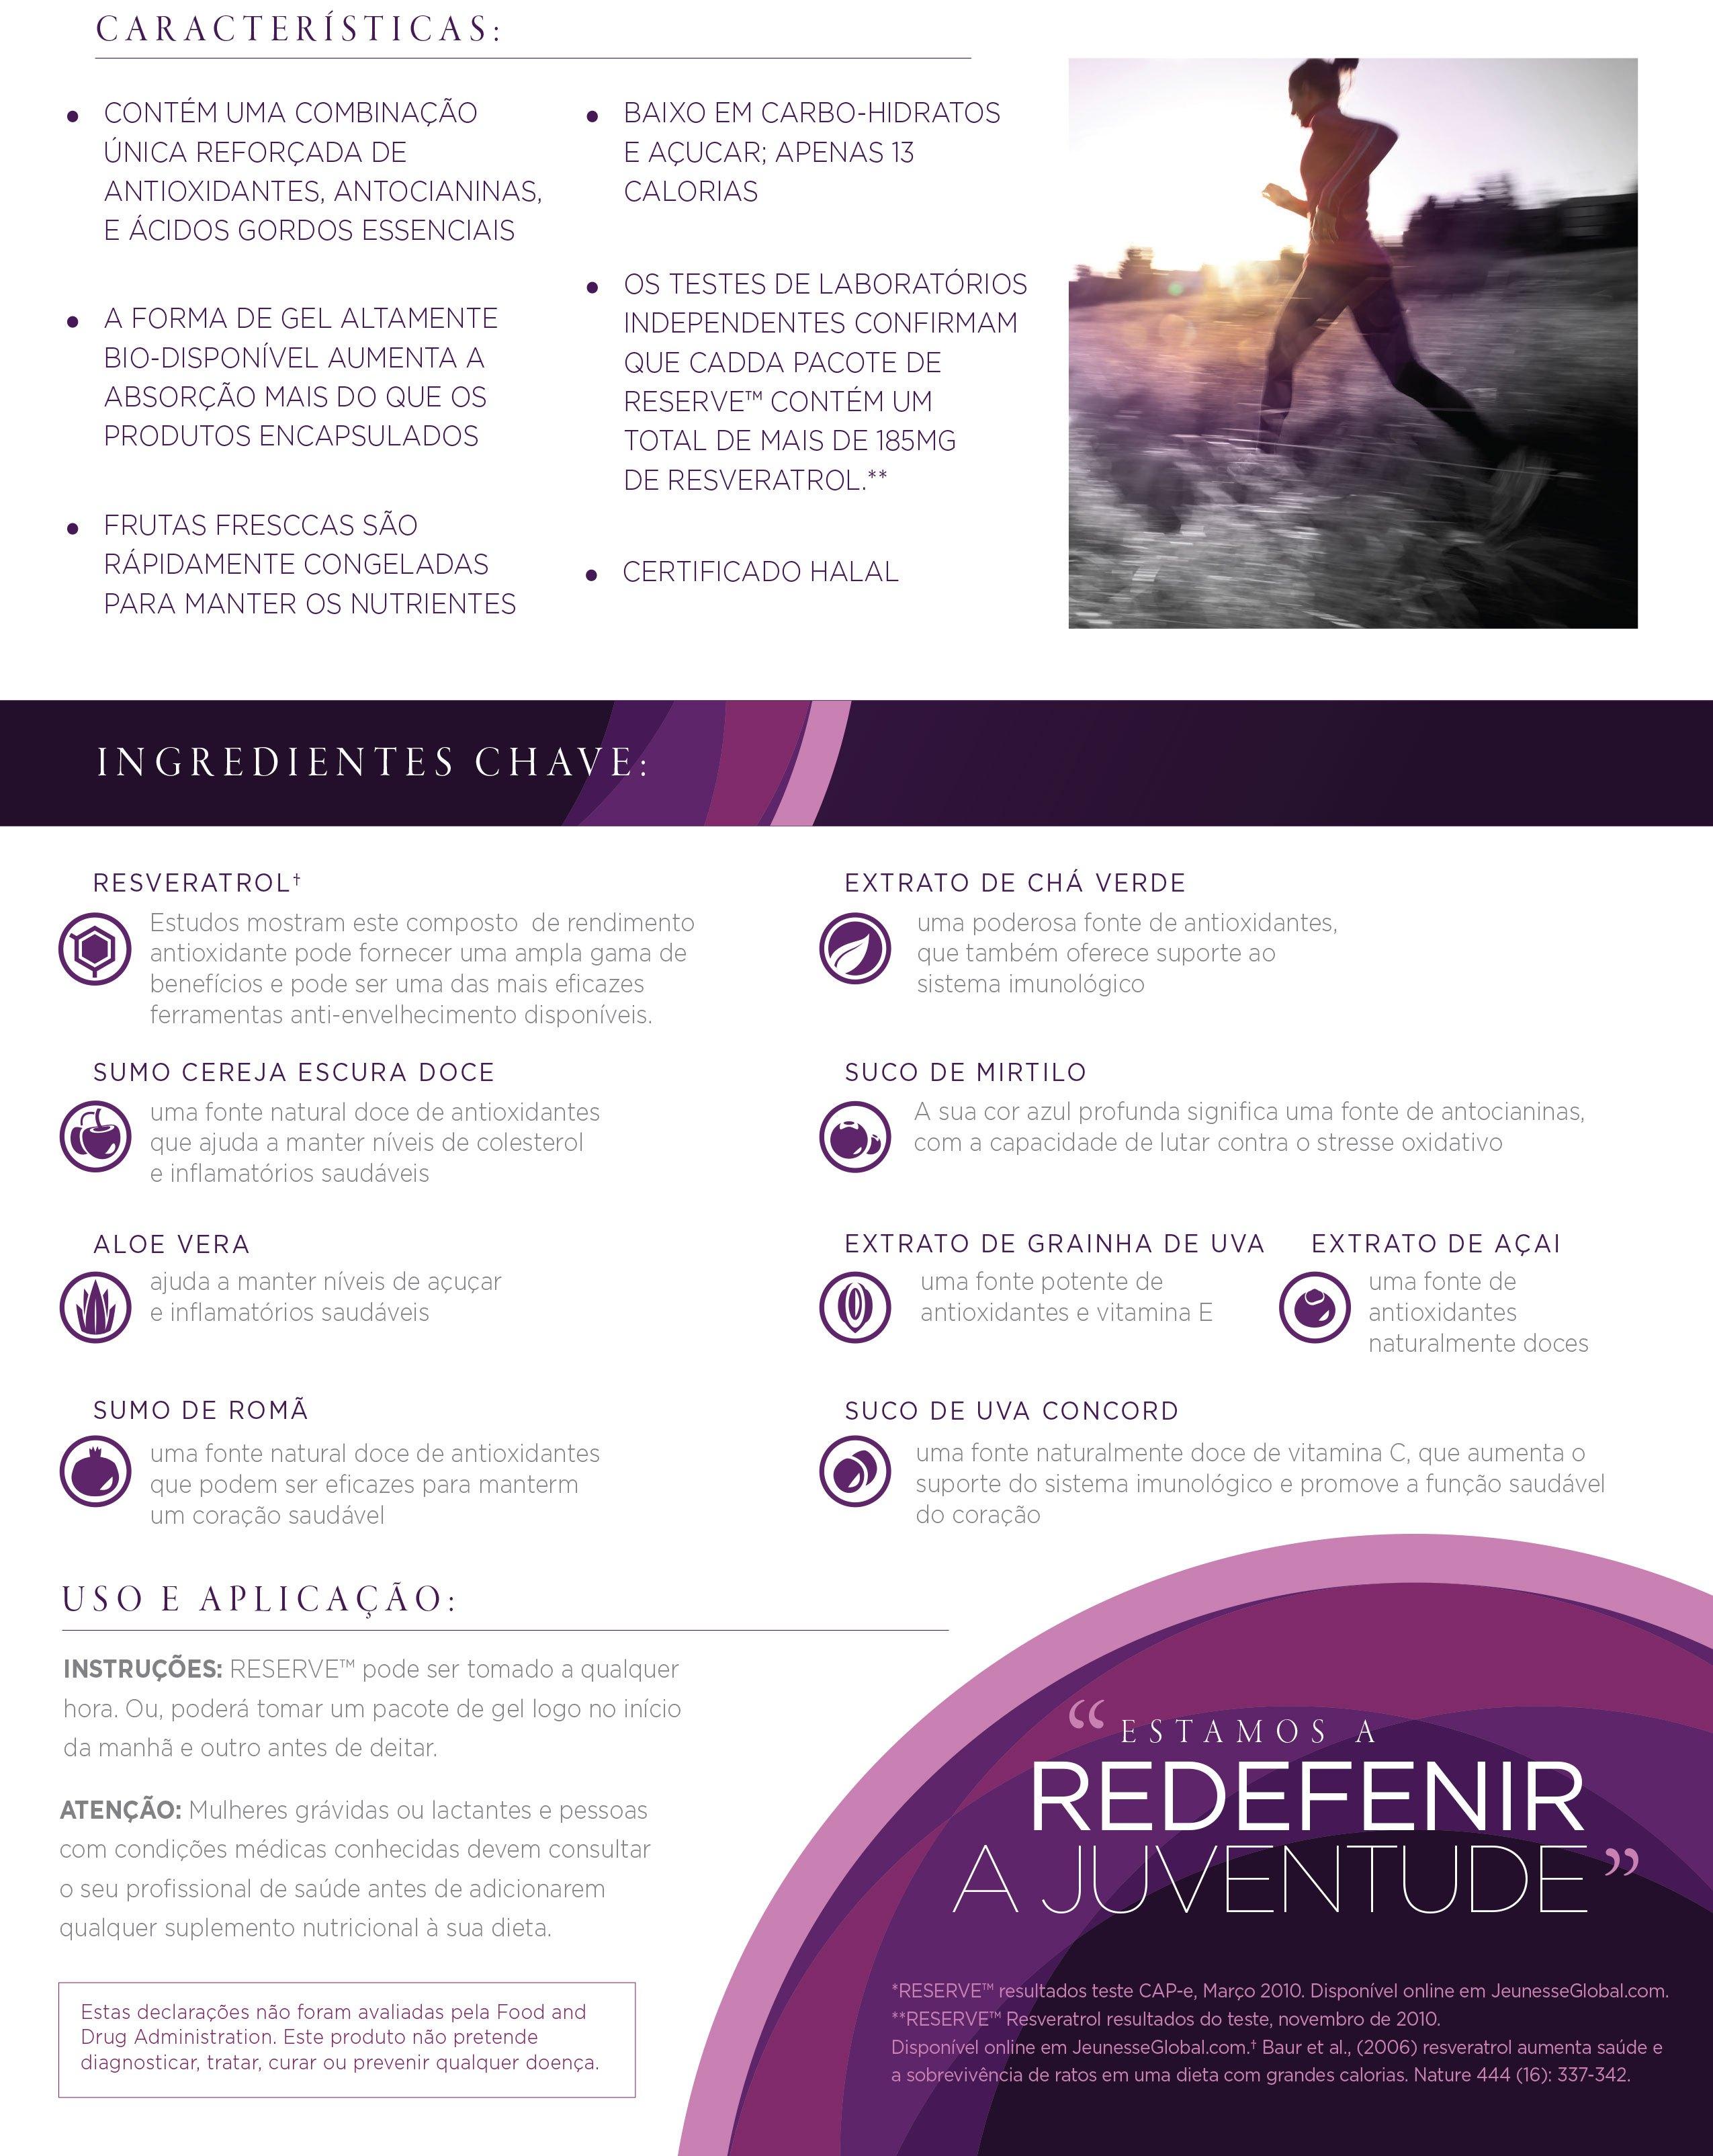 reserve_portuguese-2